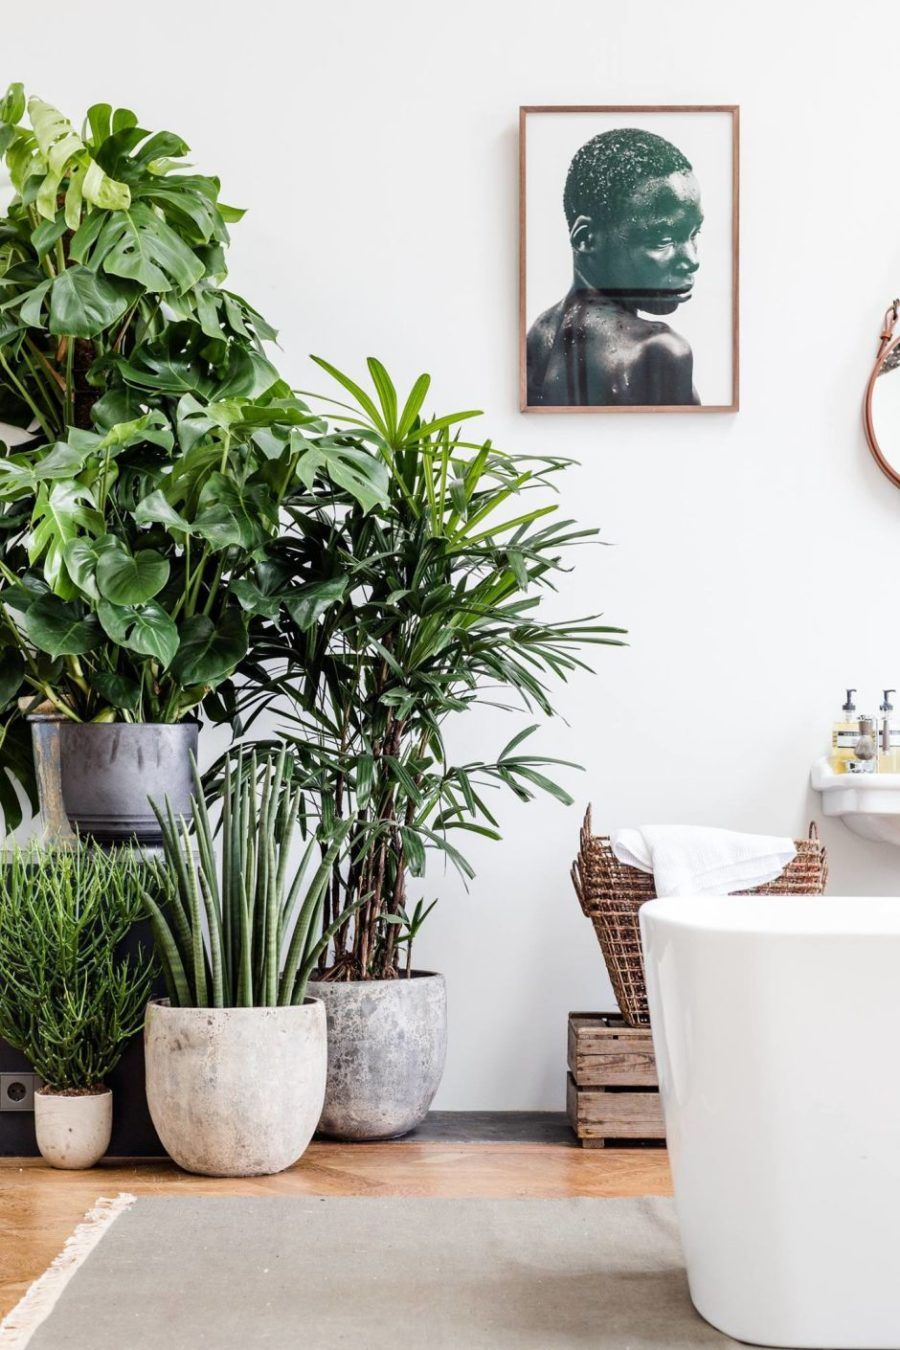 Stylish And Contemporary Interior Greenery Ideas Plant Decor